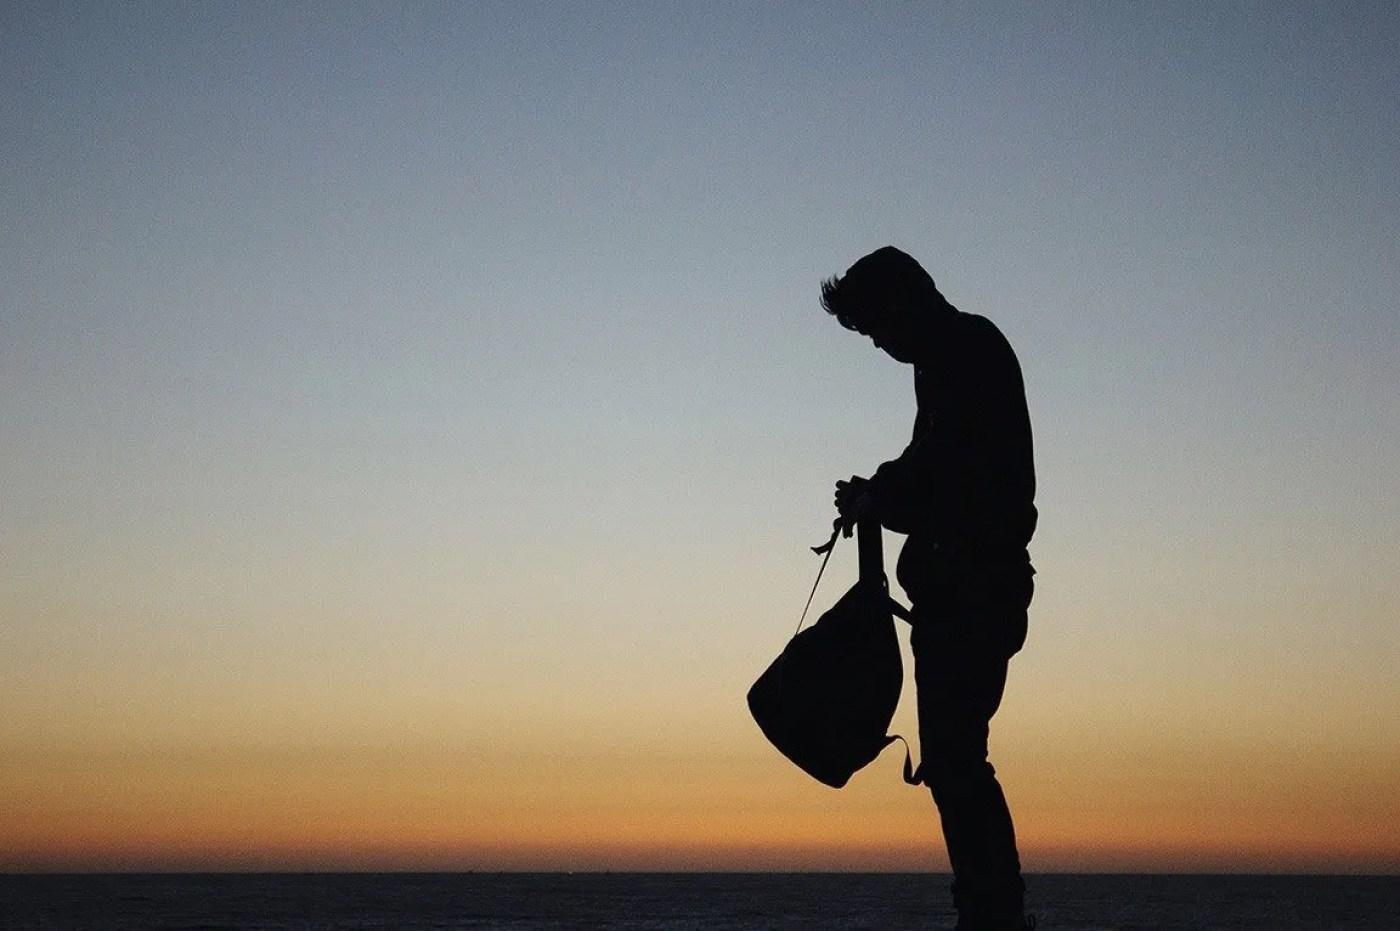 immigrant walking world travel economic abroad immigrants